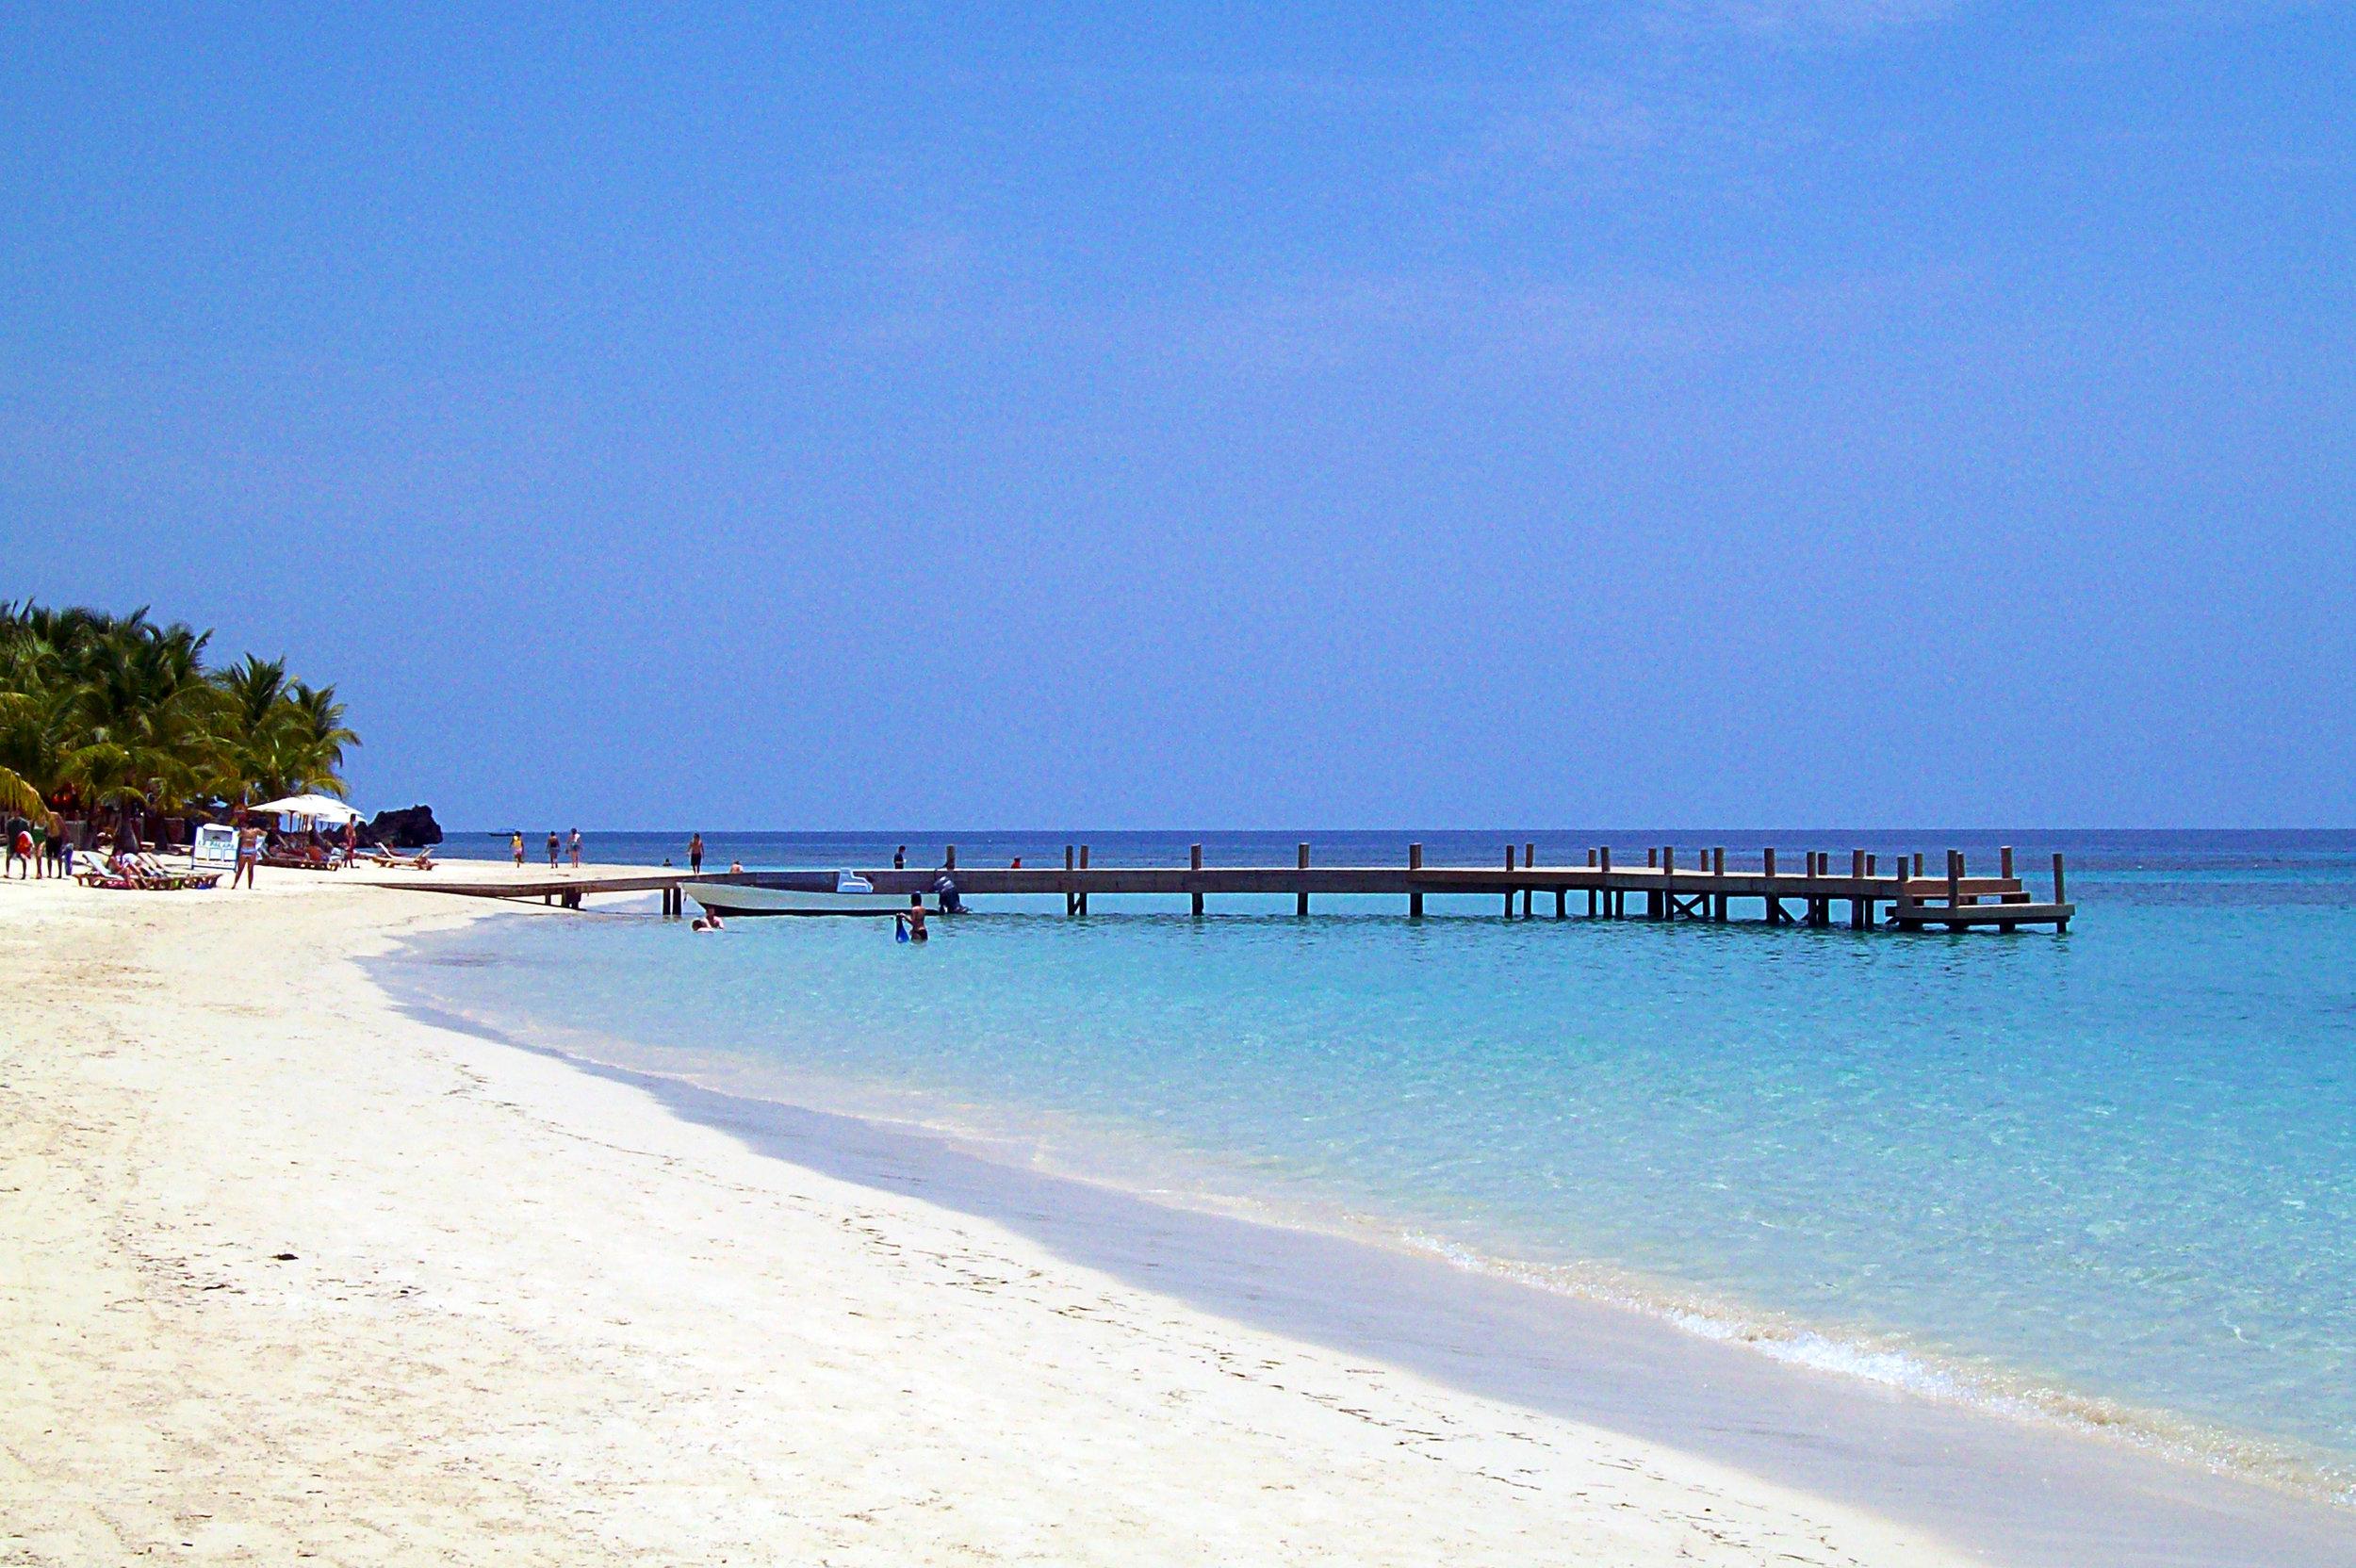 West_Bay_Beach_-Roatan_-Honduras-23May2009-d.jpg